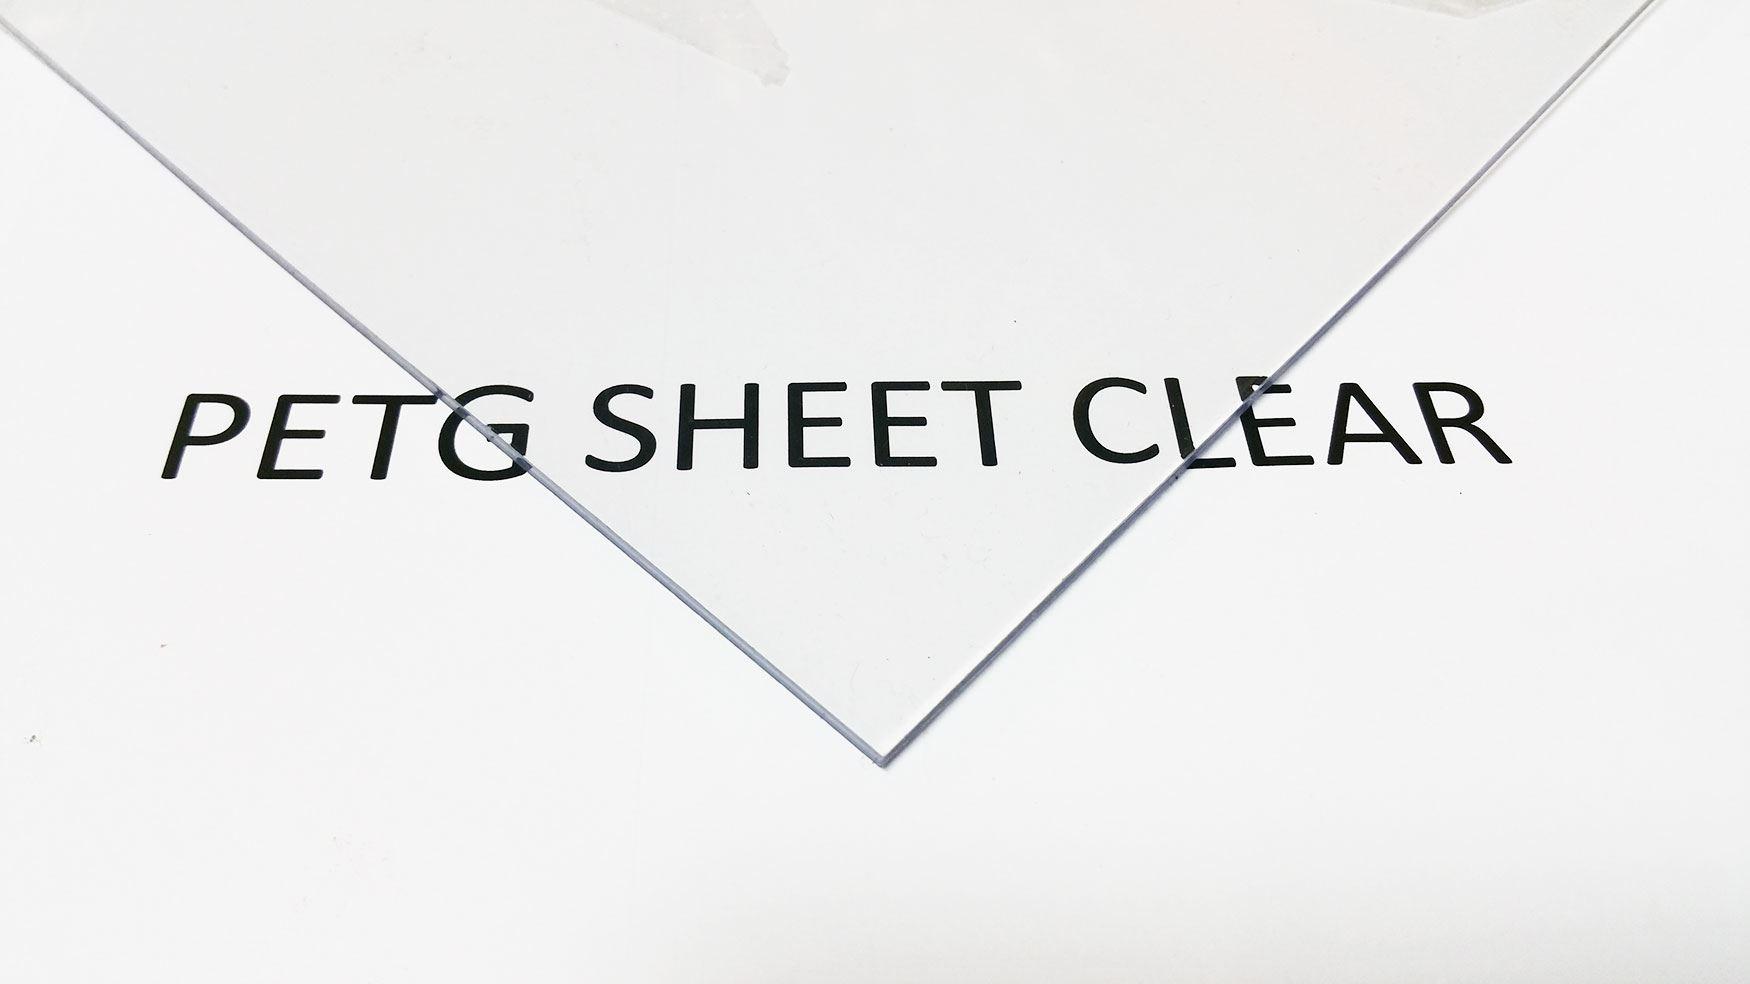 how to cut petg sheet